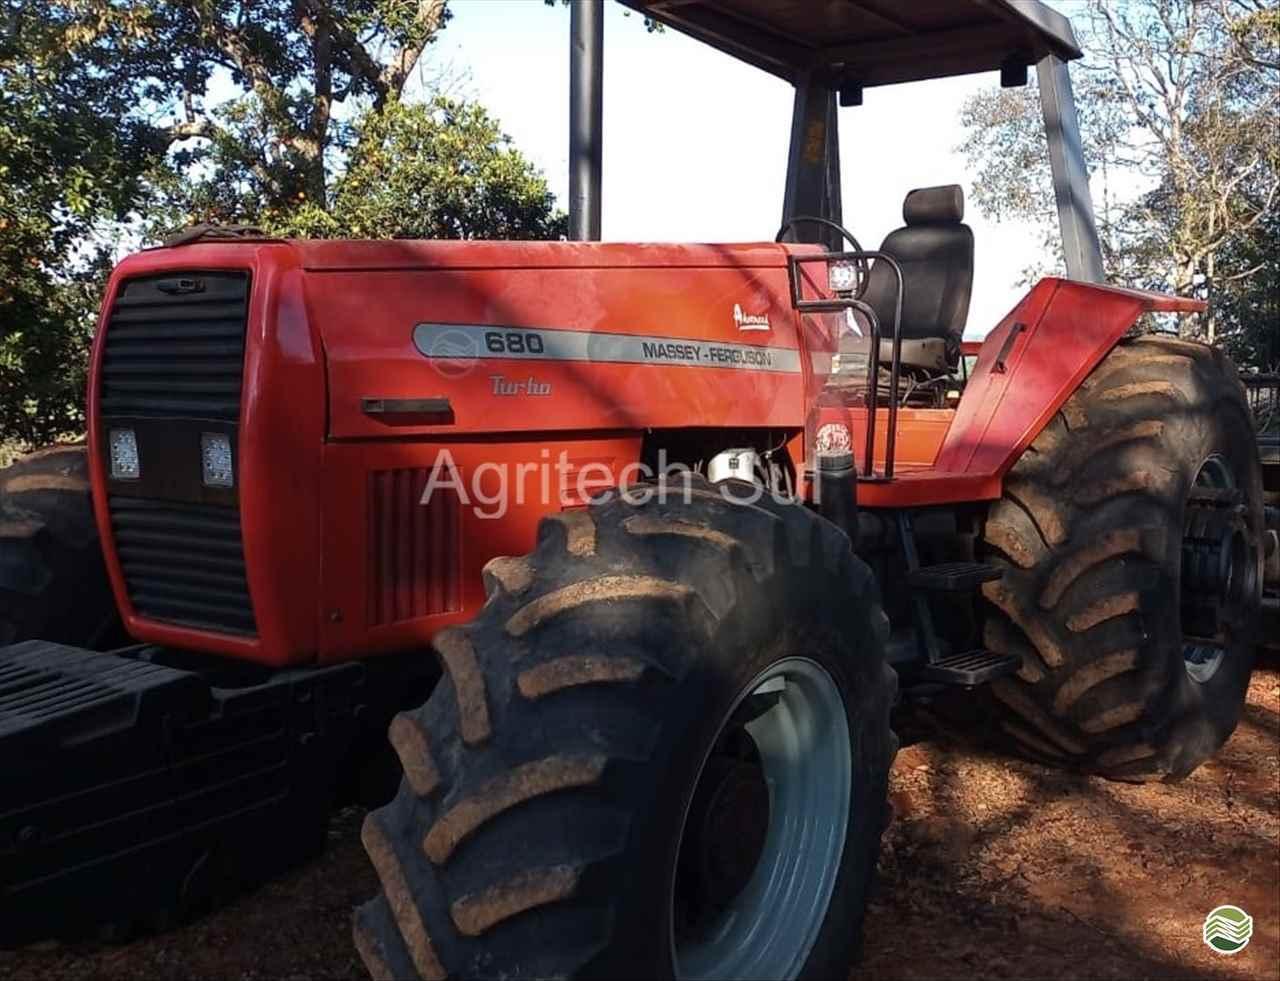 MF 680 de Agritech Sul - PASSO FUNDO/RS